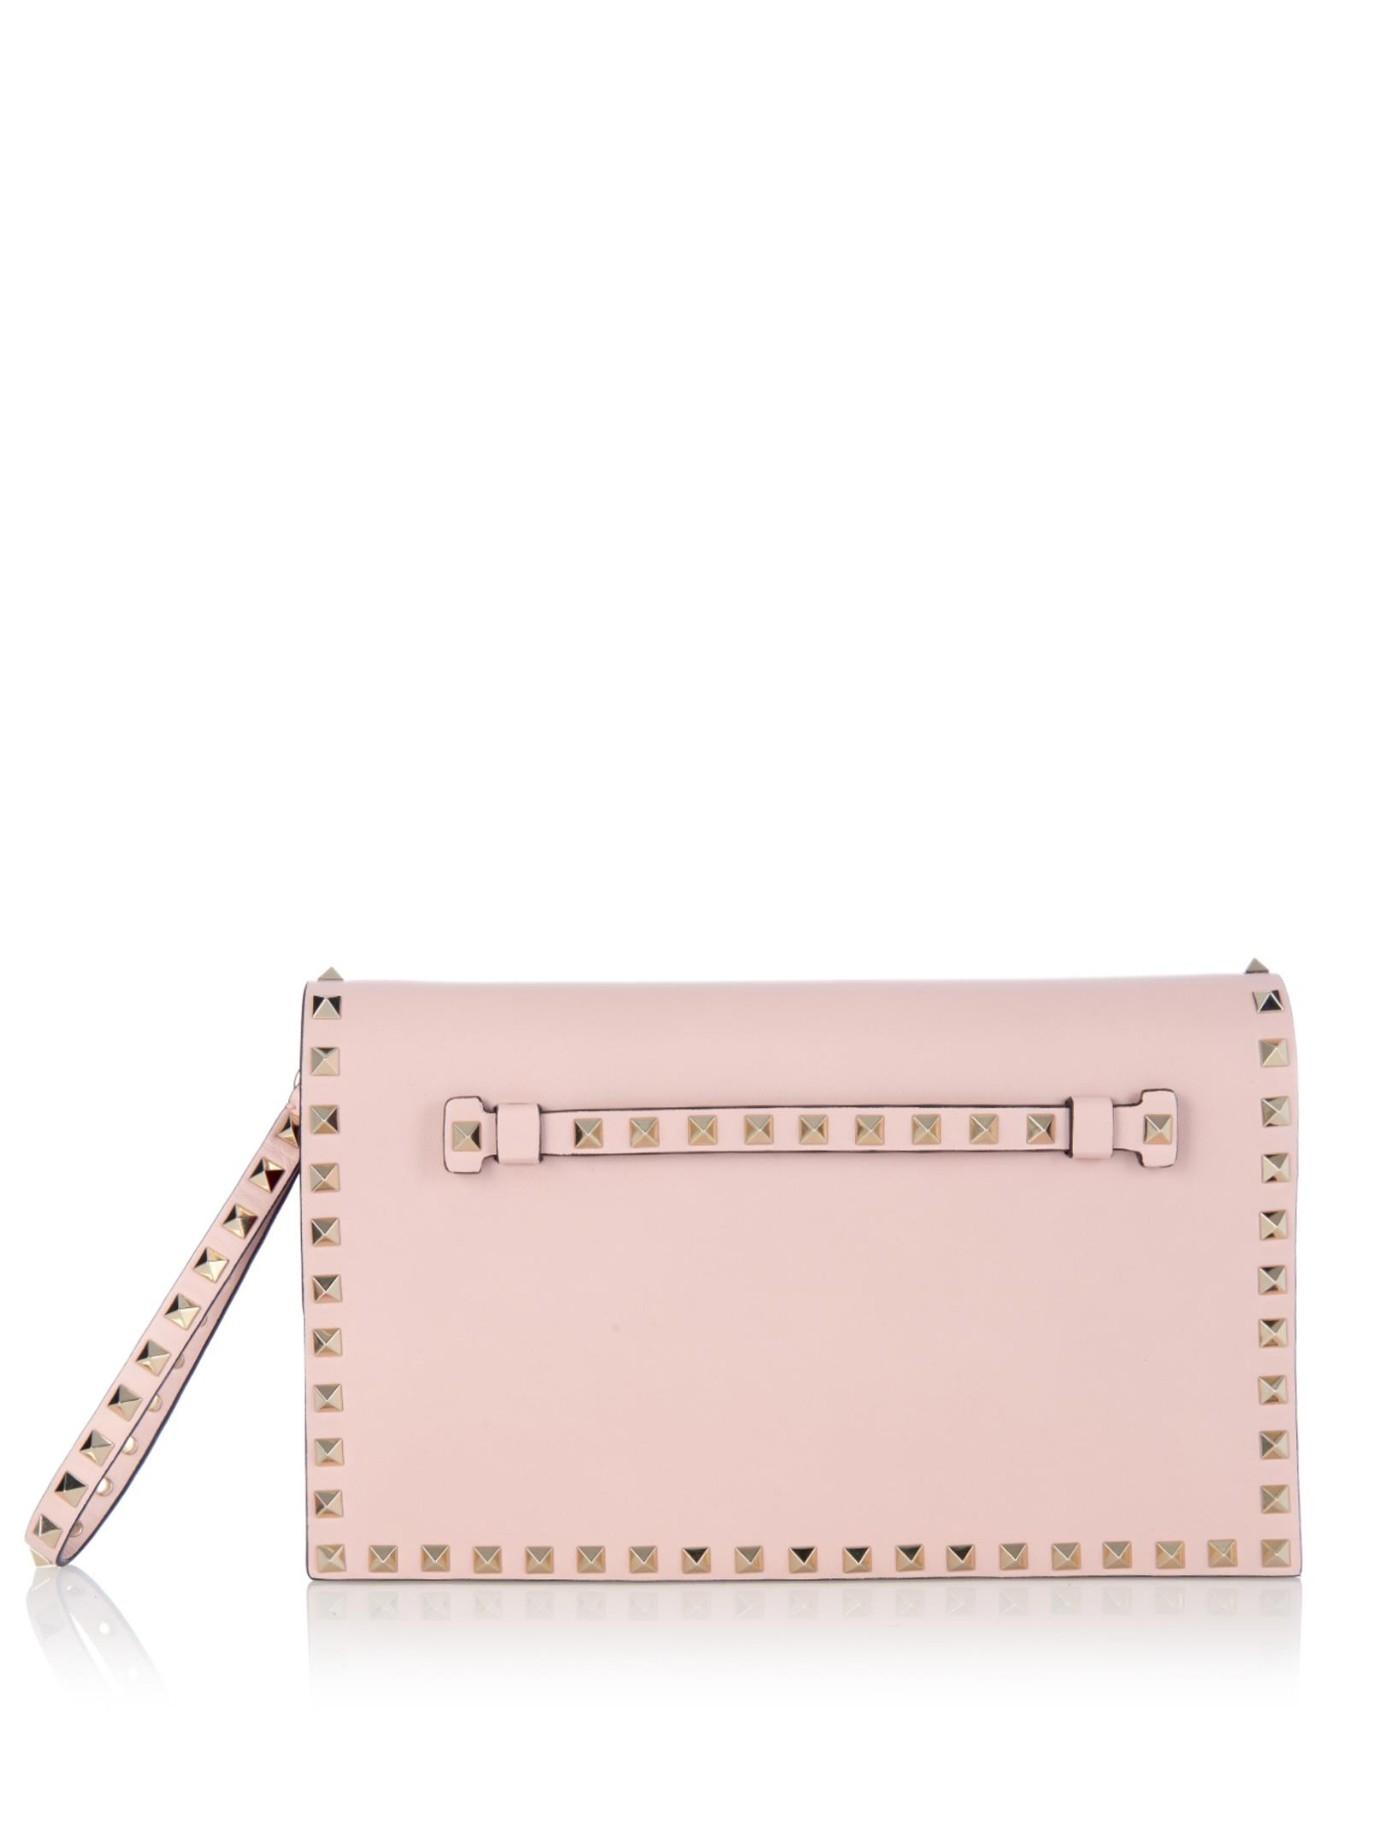 Valentino Garavani The Rockstud Leather Clutch - Baby pink Valentino huvN1ibZqn